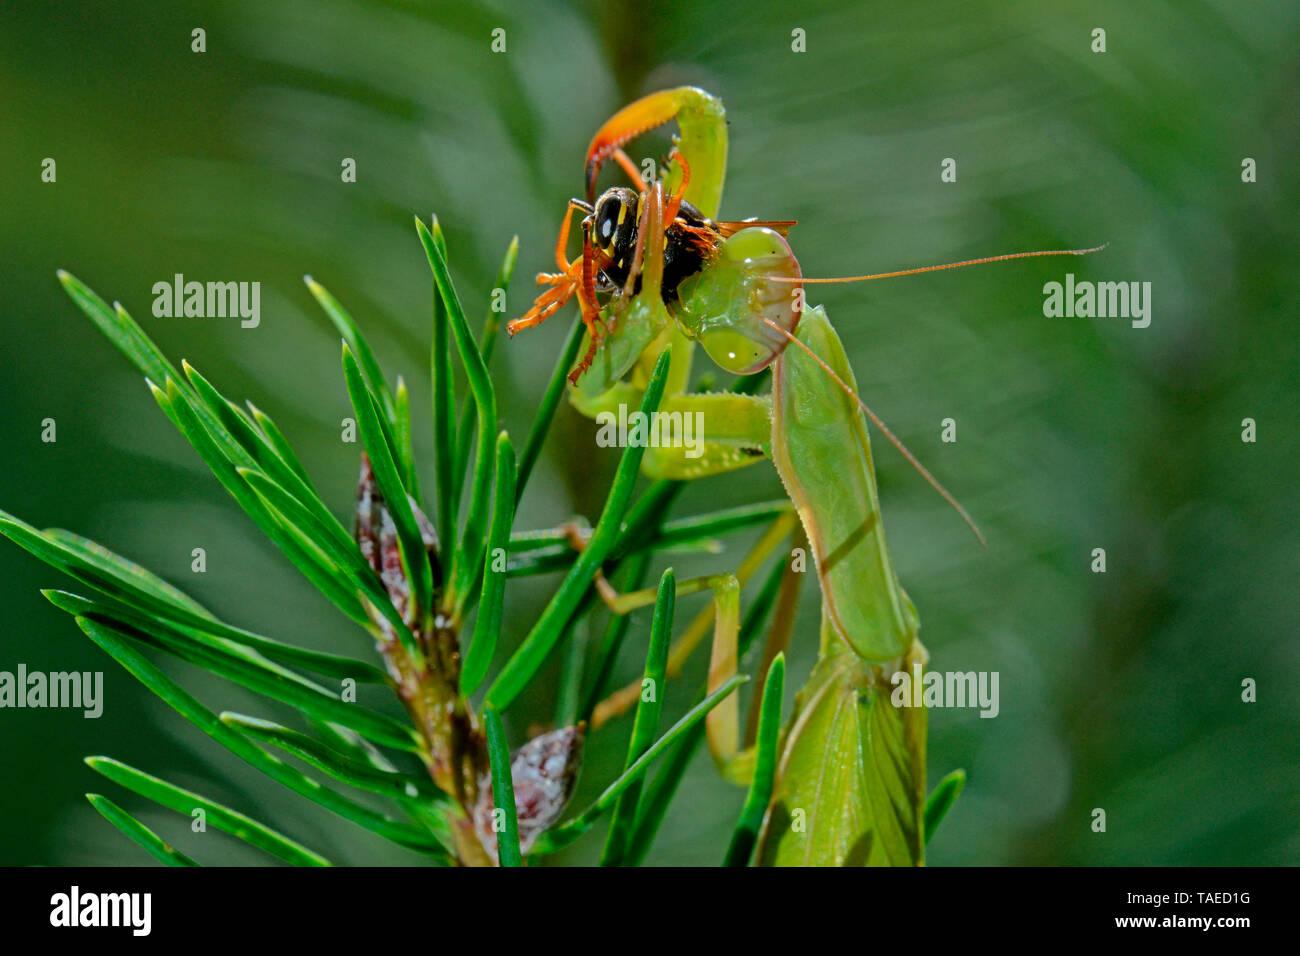 Mantis (mantis religiosa) comer una avispa de papel (Polistes sp) Romero en verano, Cataluña, España Foto de stock